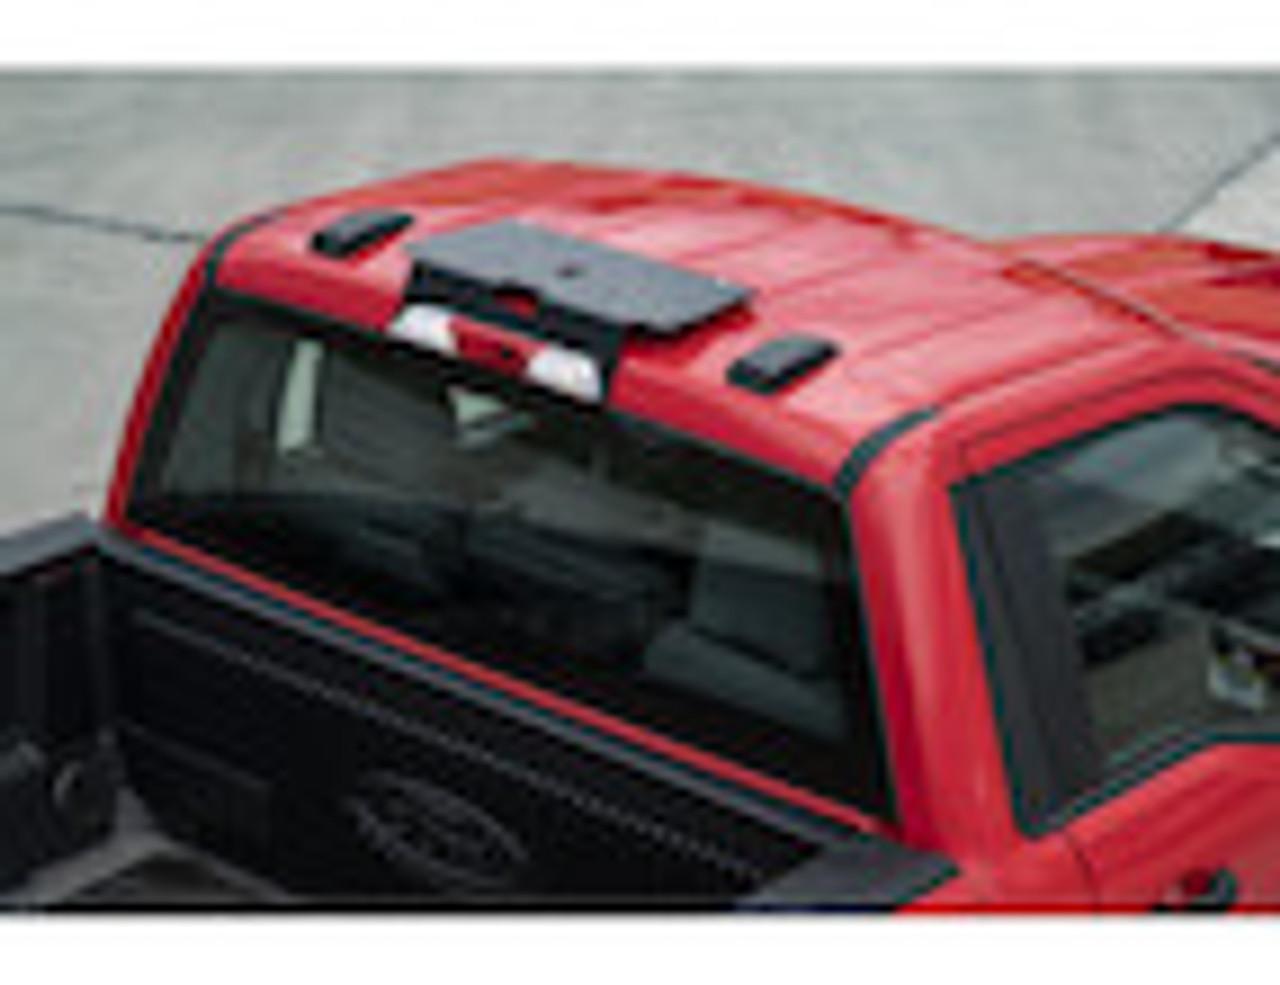 8895551 --- Fleet Series Drill-Free Light Bar Cab Mount - Ford